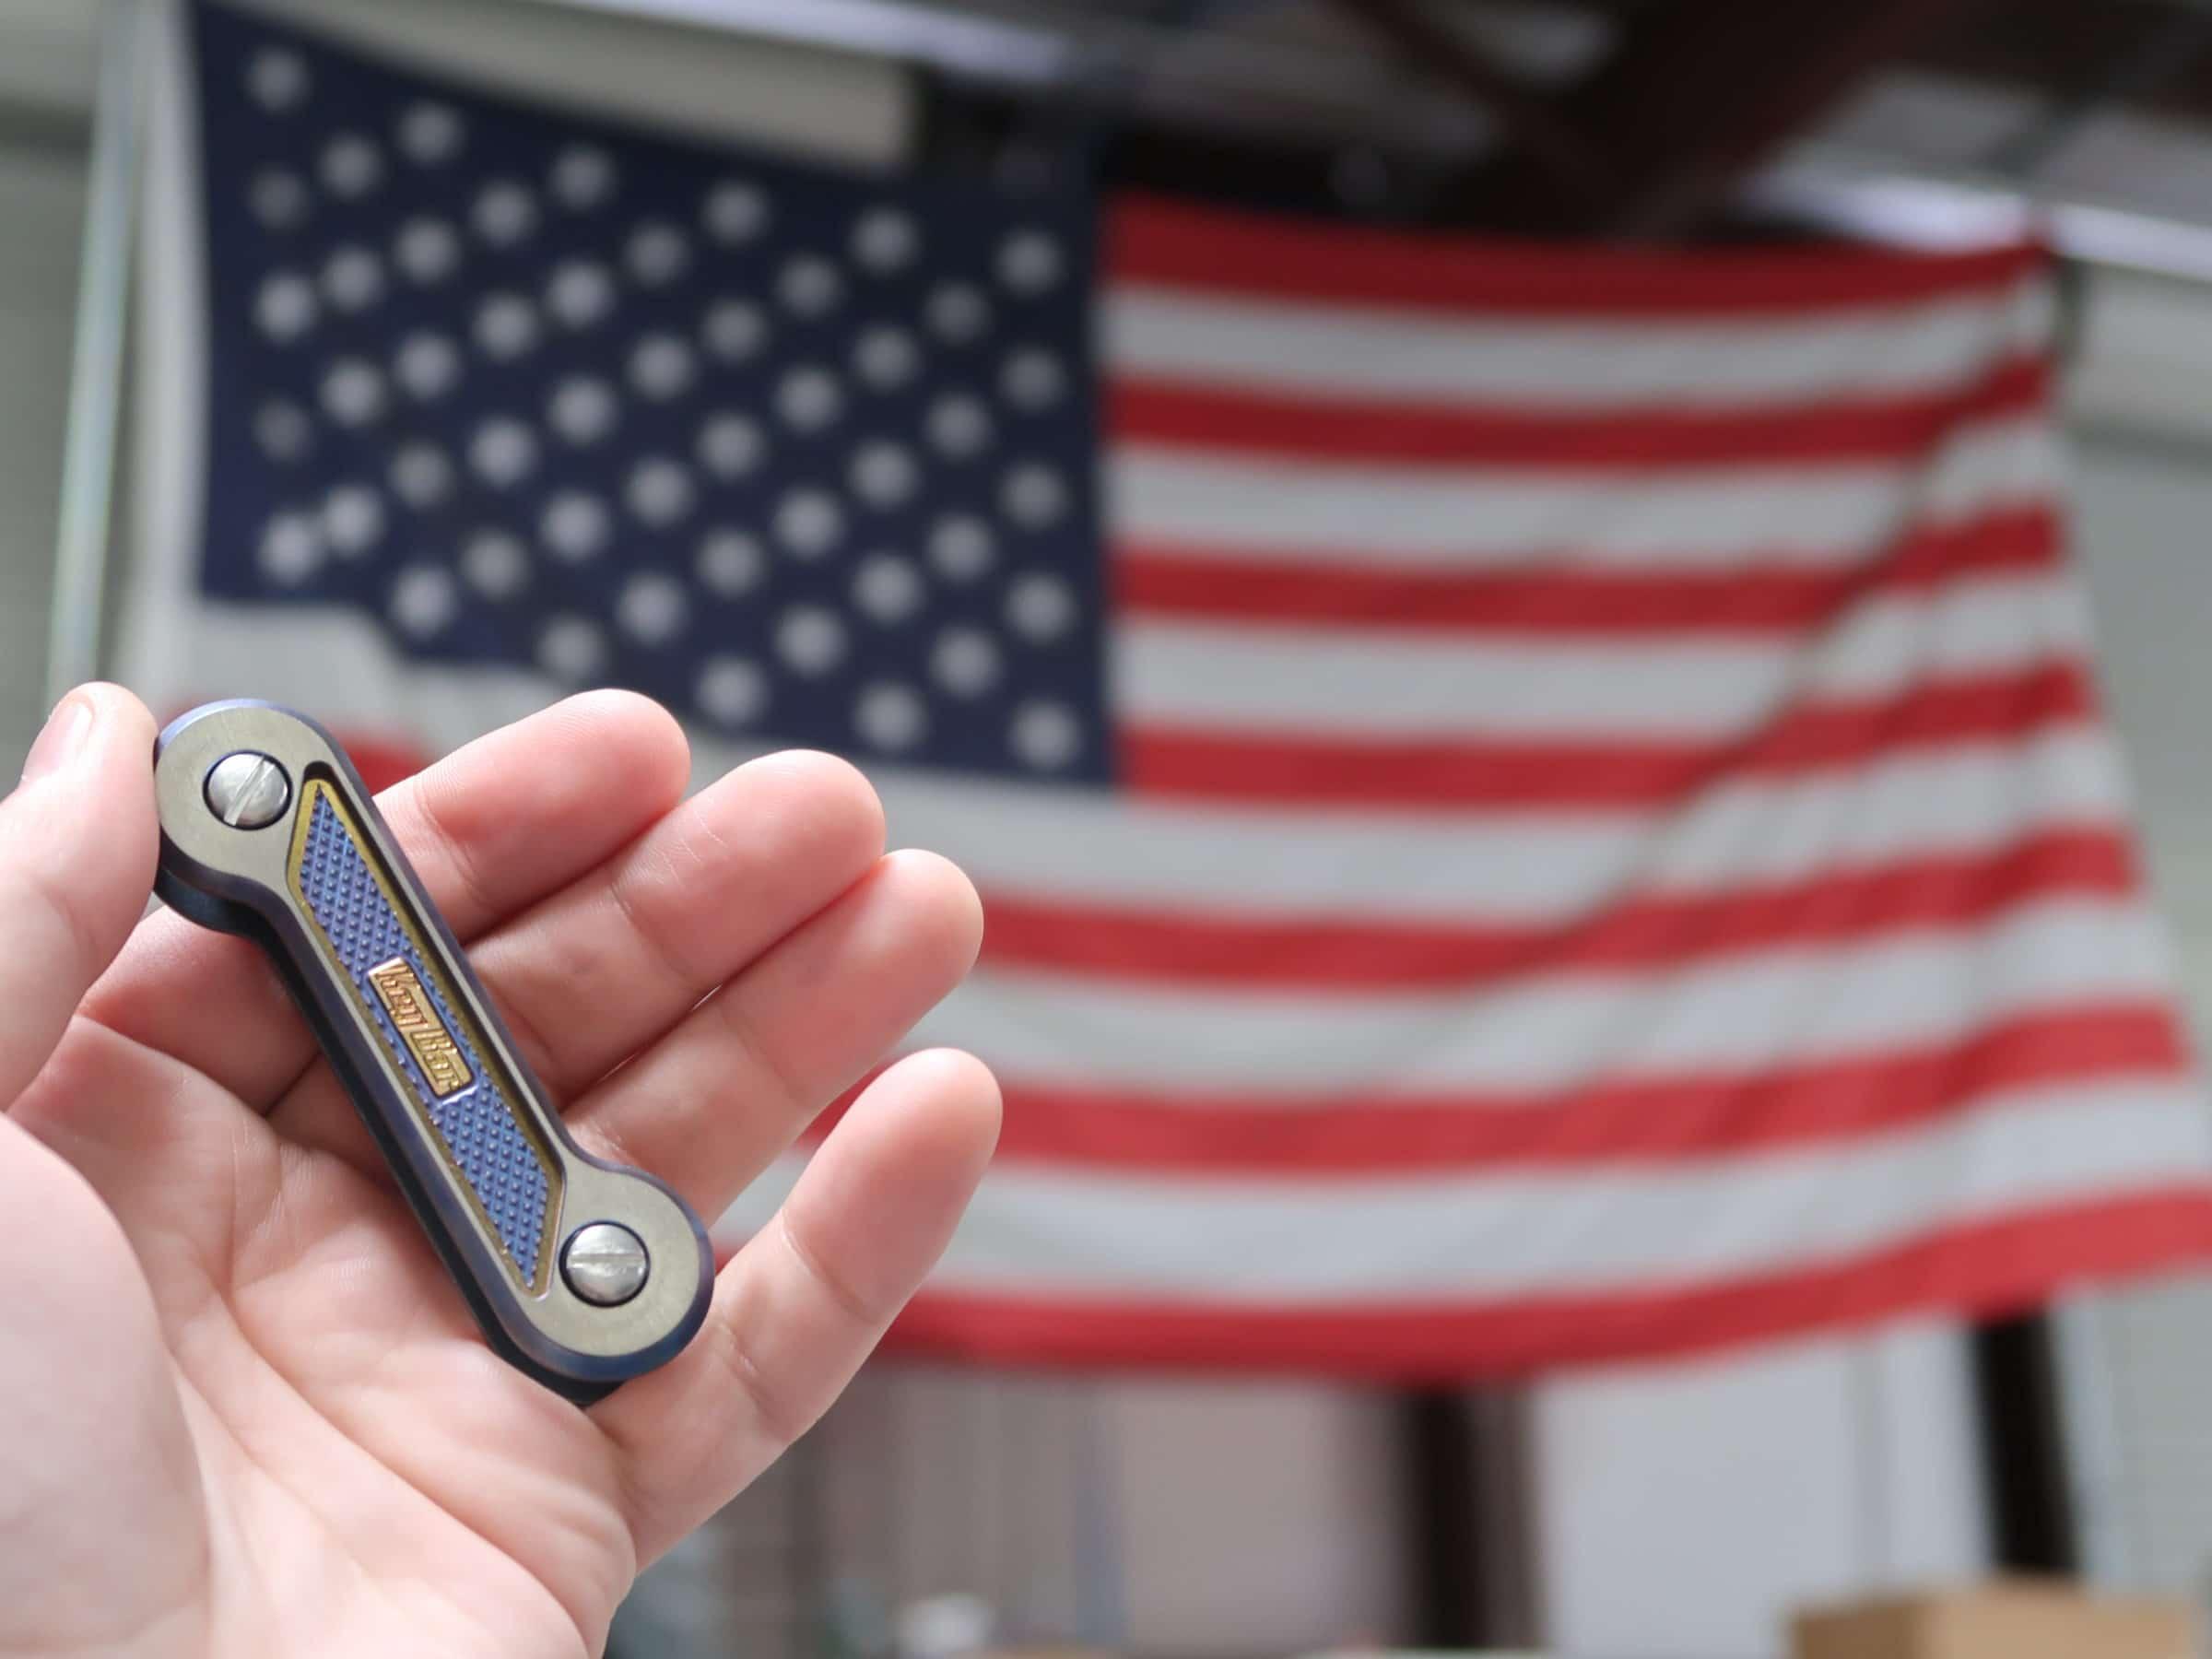 Blue Gilded Diamond Crosshatch KeyBar With American Flag